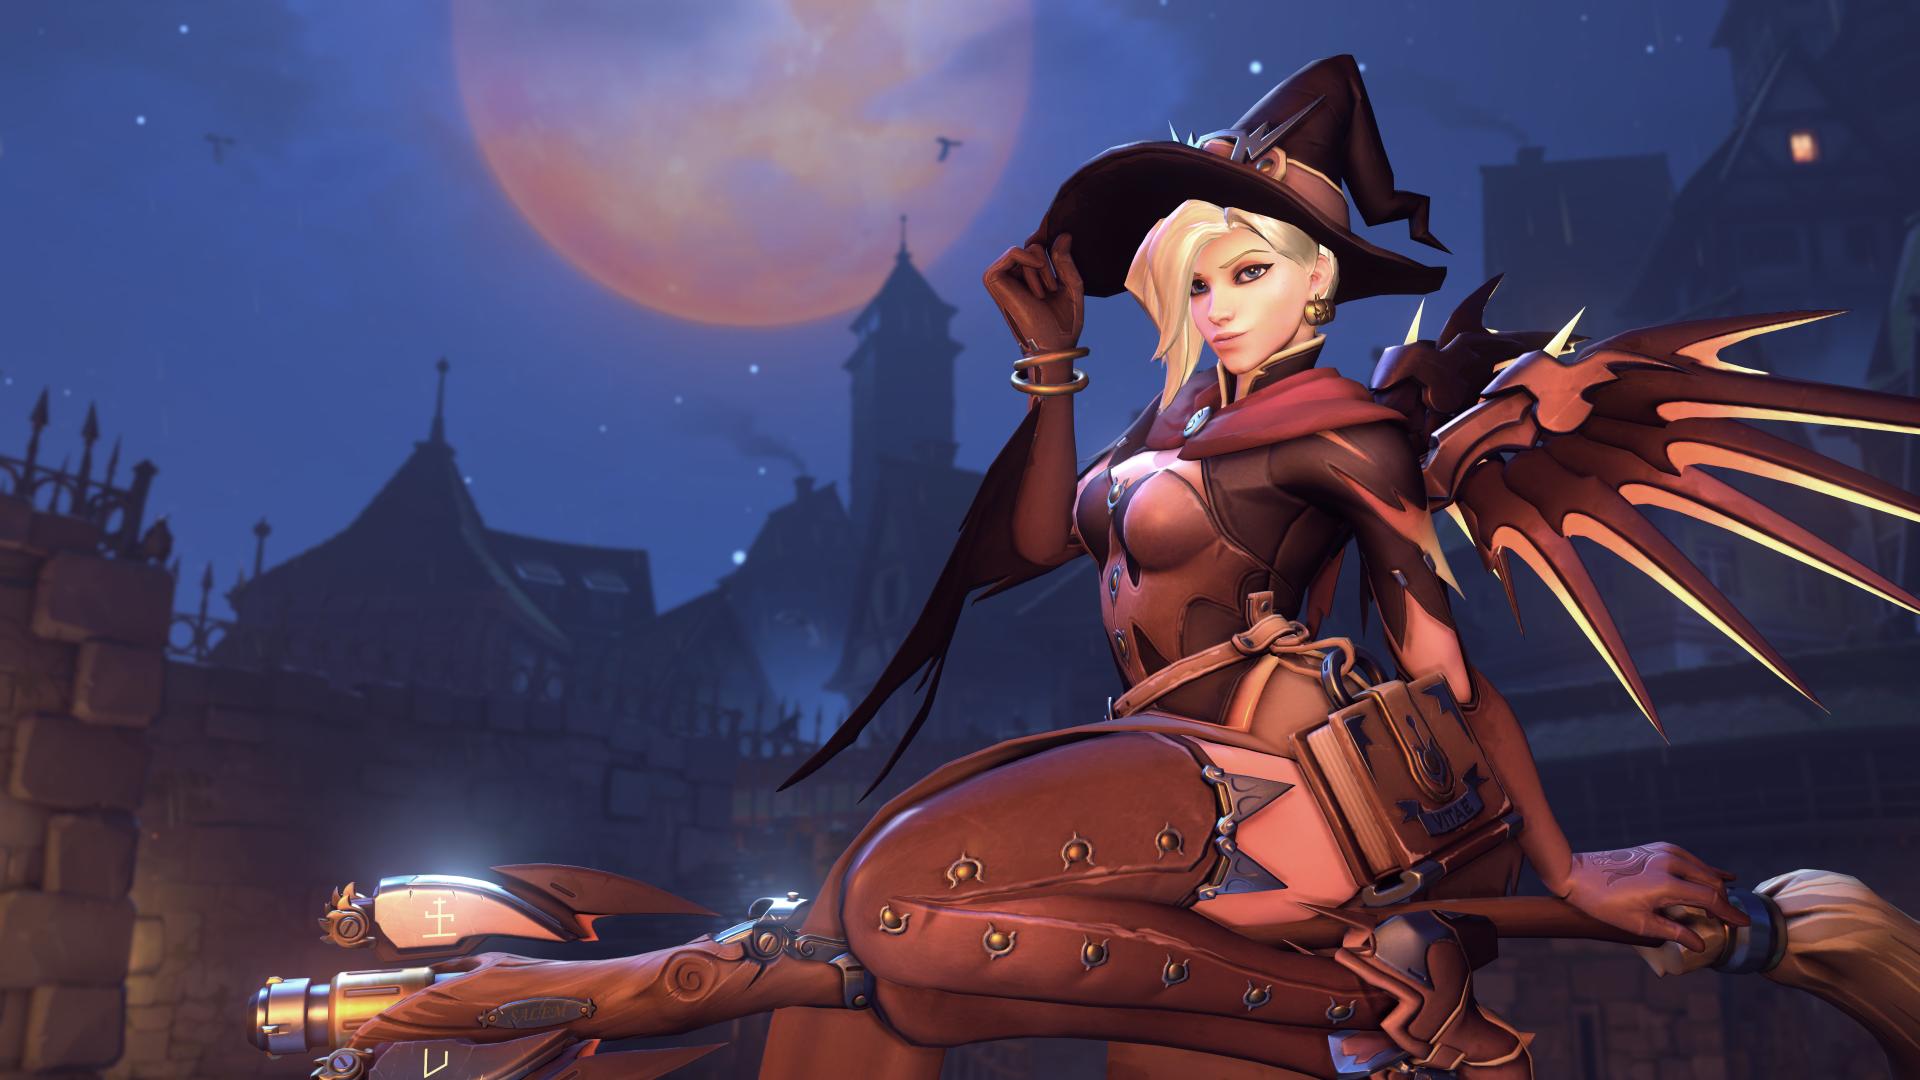 Download Wallpaper Halloween Overwatch - latest?cb\u003d20171011193505  HD_742989.png/revision/latest?cb\u003d20171011193505